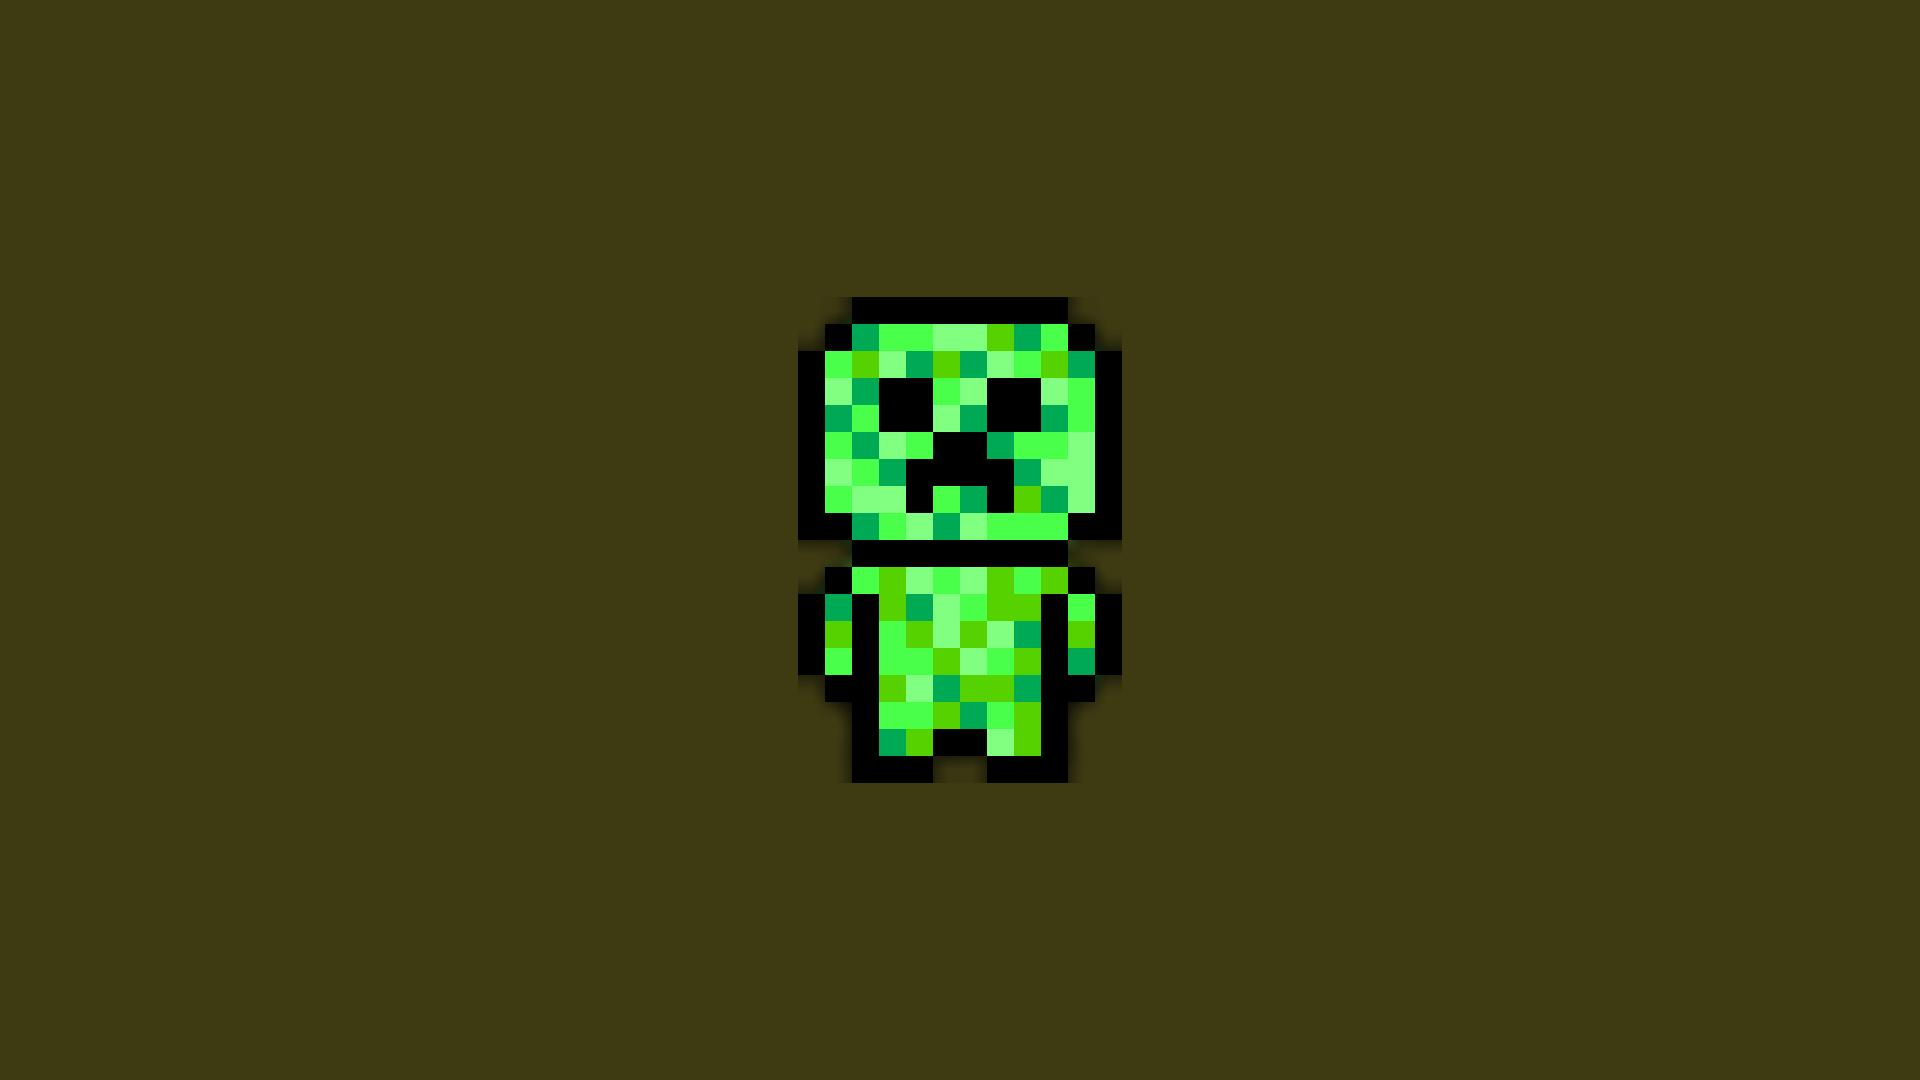 Simple Wallpaper Minecraft Design - illustration-pixel-art-text-Minecraft-creeper-pixels-lighting-design-symbol-number-screenshot-font-2891  Gallery_204835.png